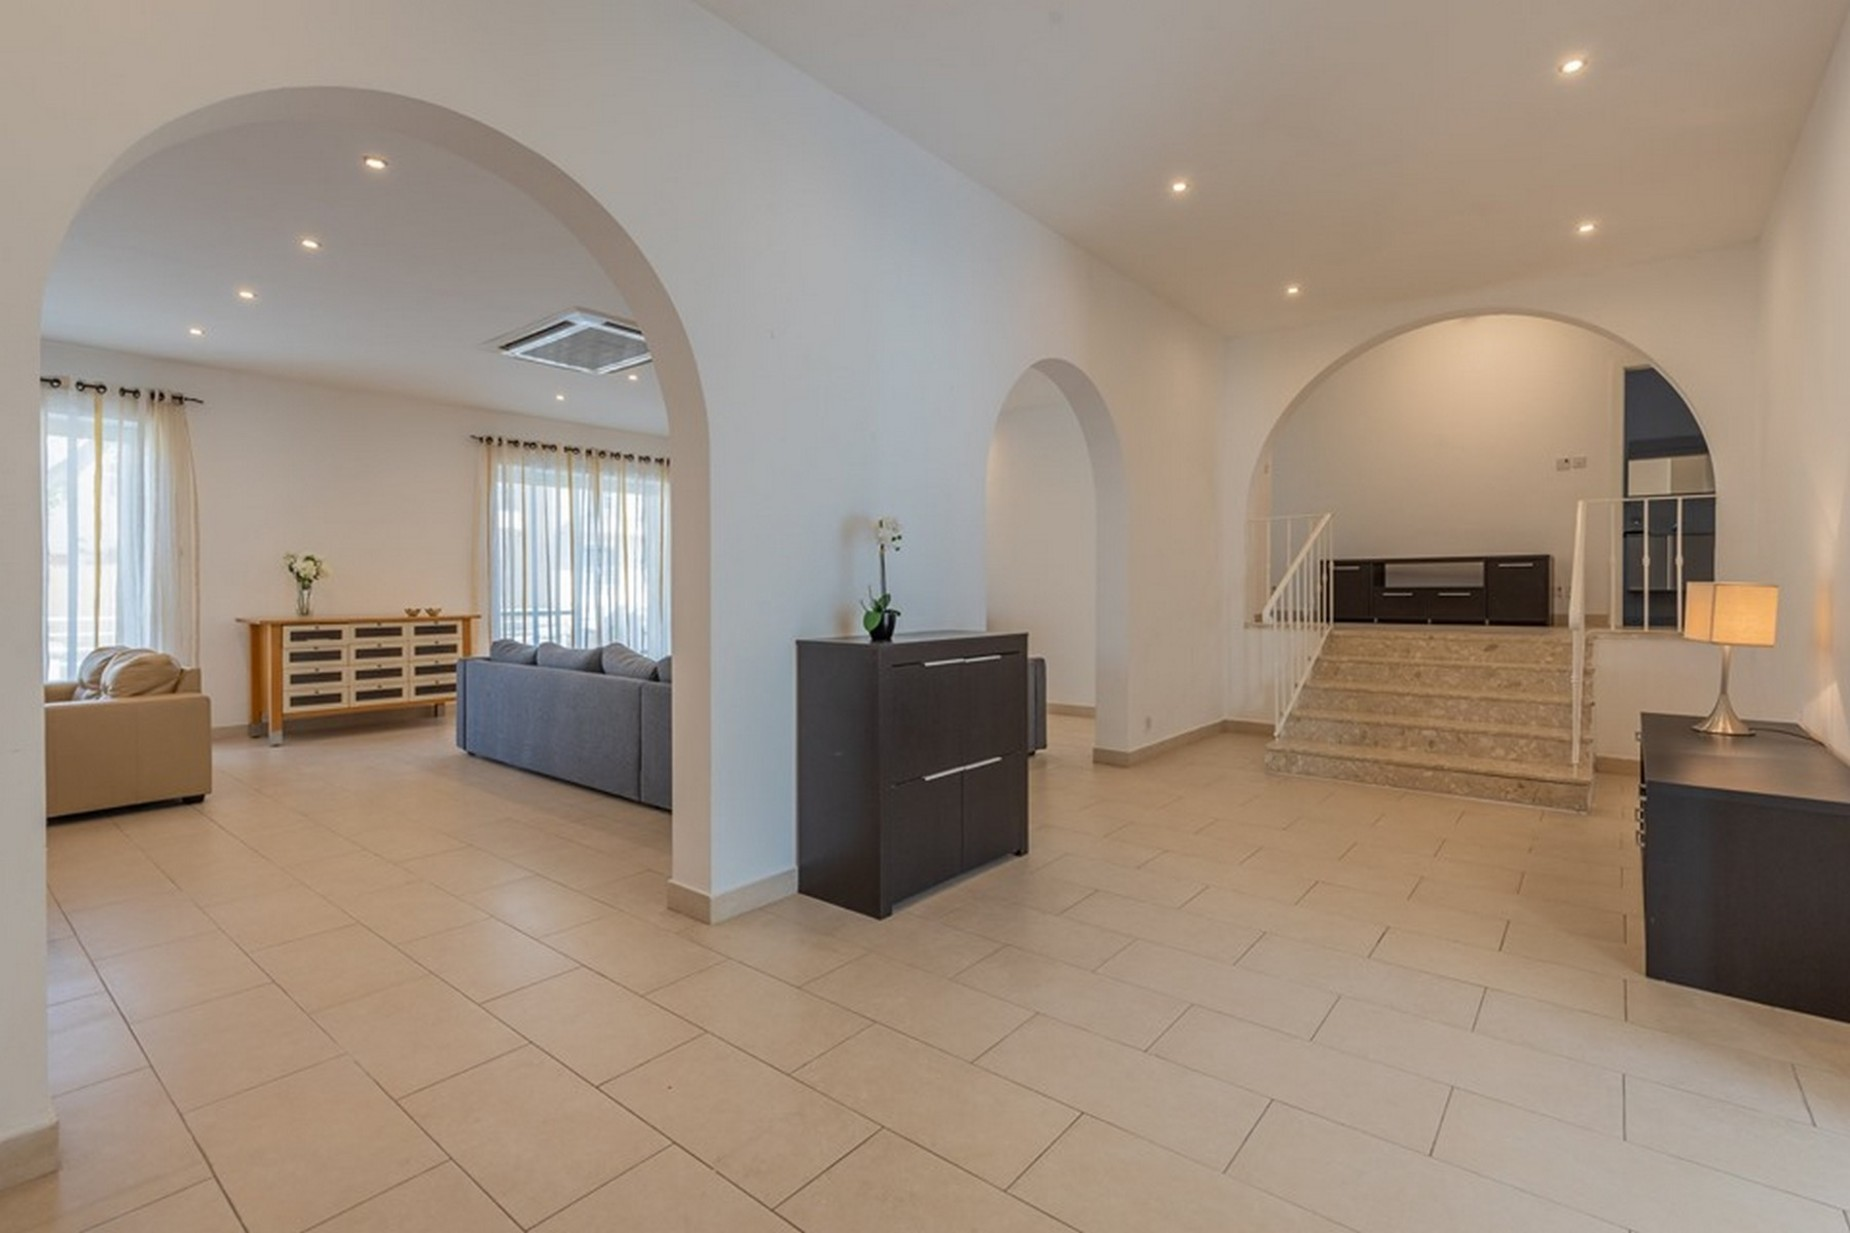 3 bed Maisonette For Rent in Ibragg, Ibragg - thumb 11